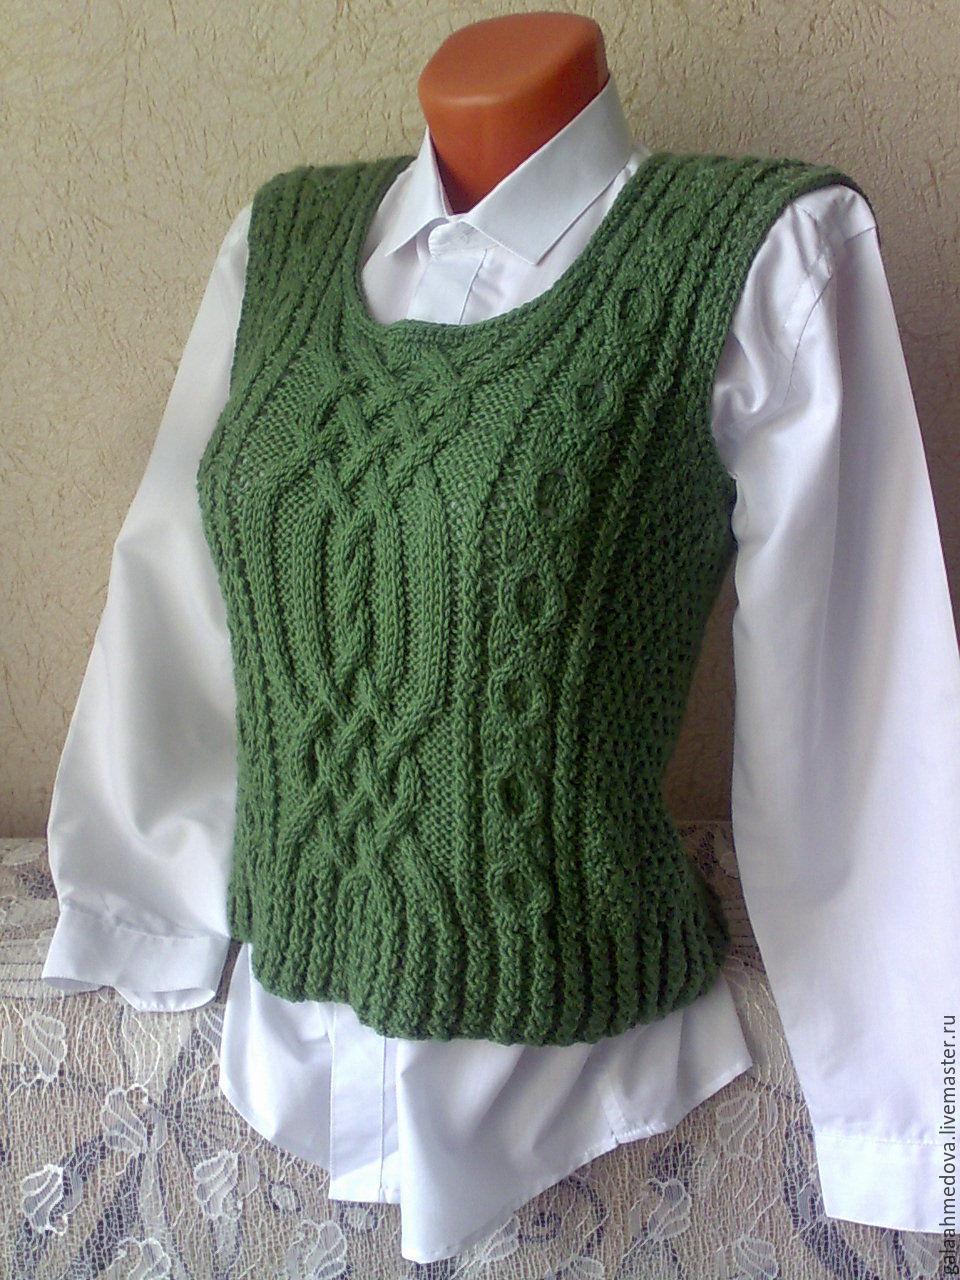 beautiful vest,buy vest,tank top,knitted vest,knitted vest,handmade vest handmade,buy a warm jacket, for winter,office vest,stylish vest,fashion vest,vest